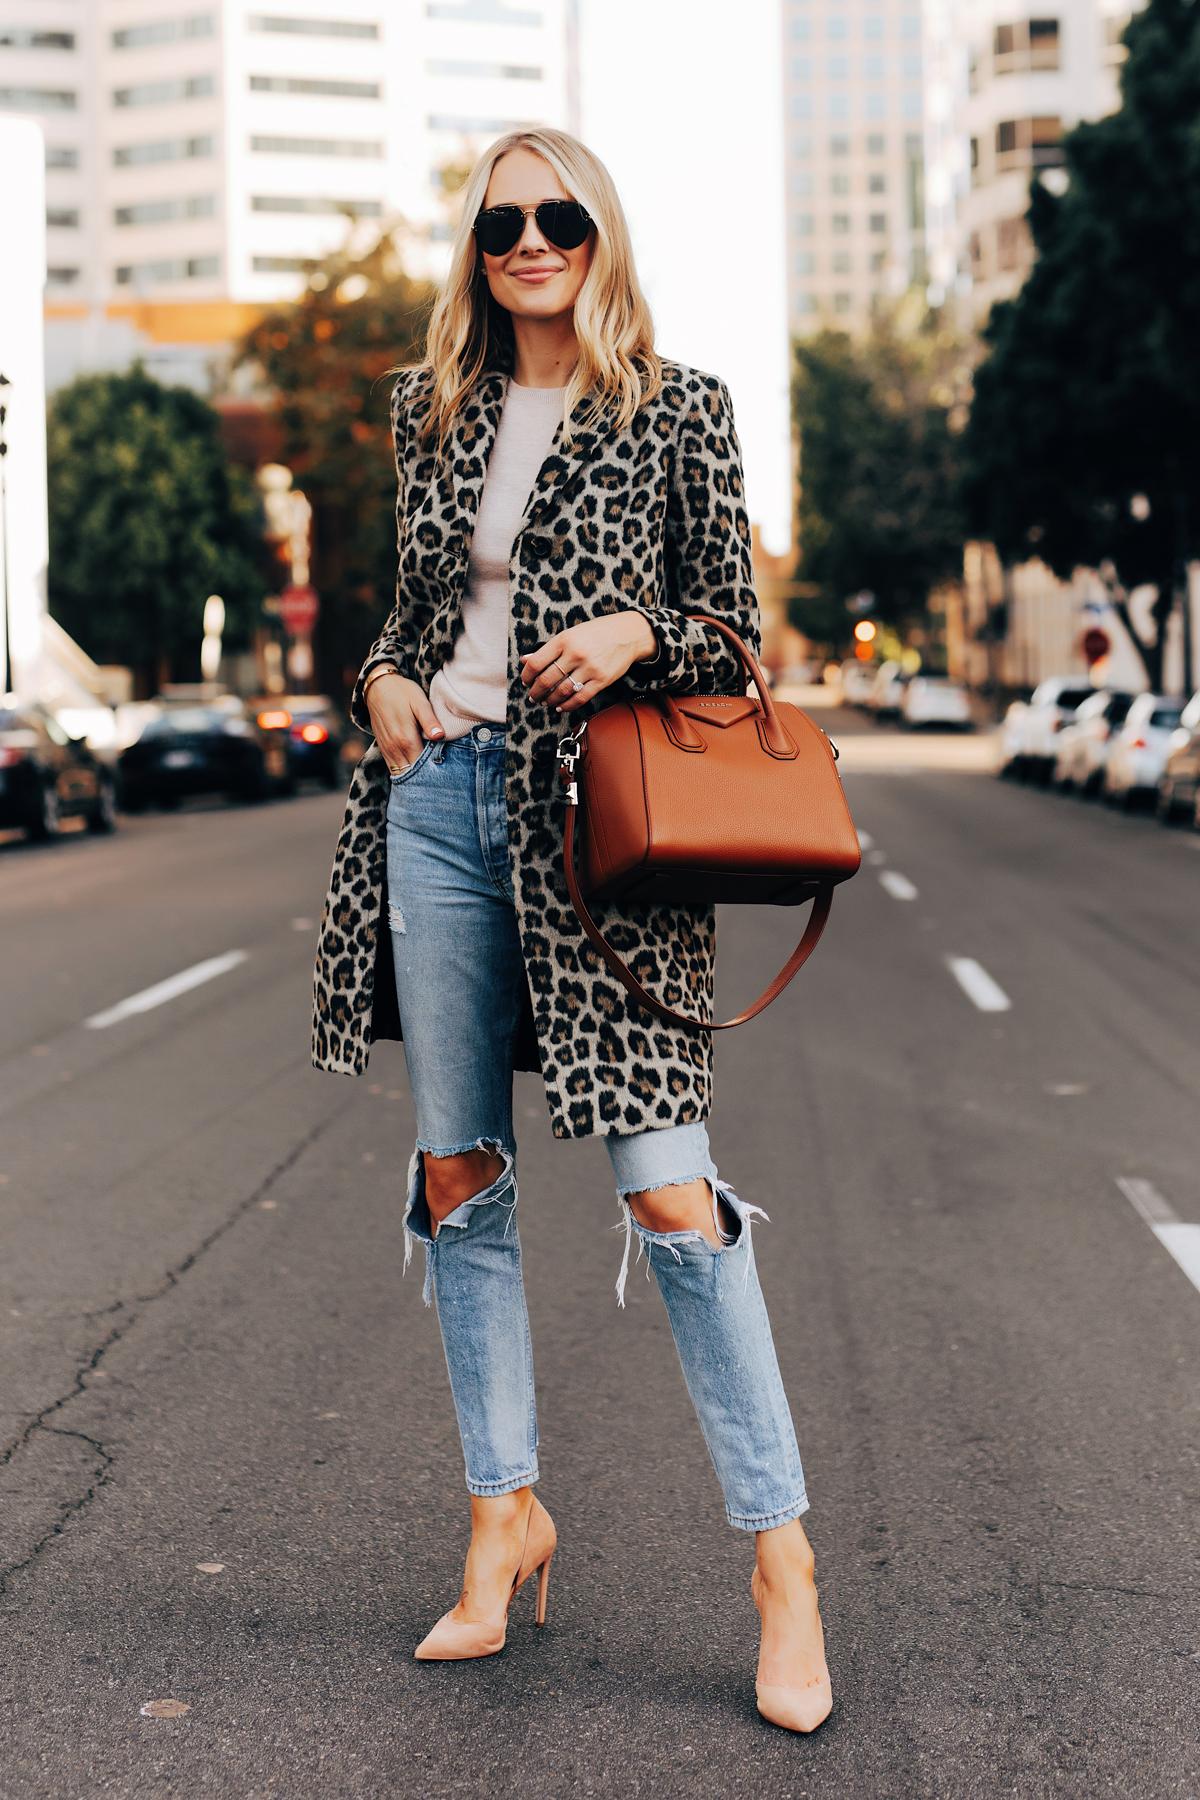 Fashion Jackson Wearing Ann Taylor Leopard Coat Ripped Jeans Nude Pumps Givenchy Antigona Cognac Satchel 2